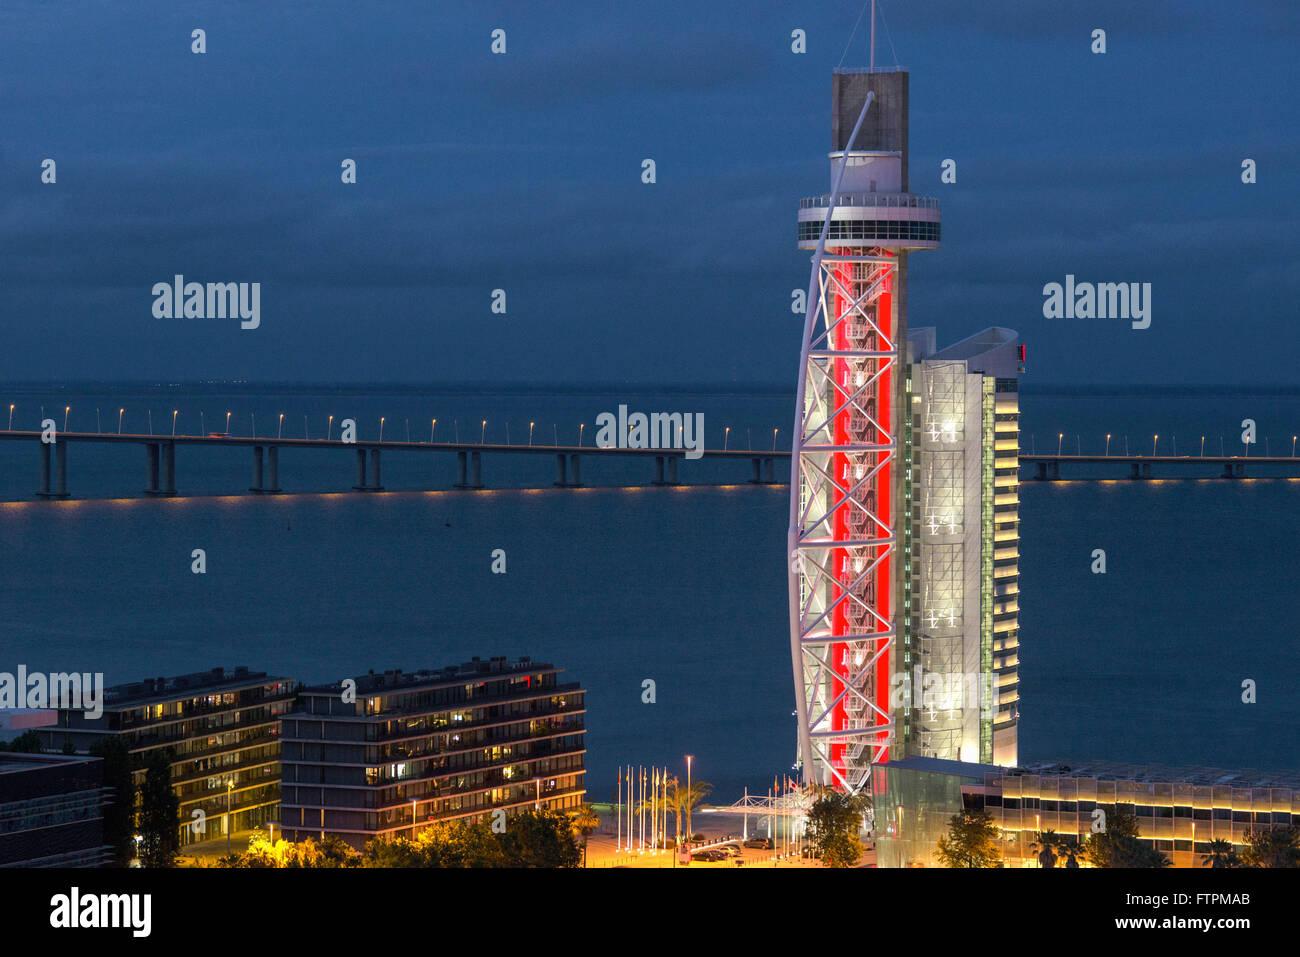 Vasco da Gama Tower in the Park of Nations - Stock Image